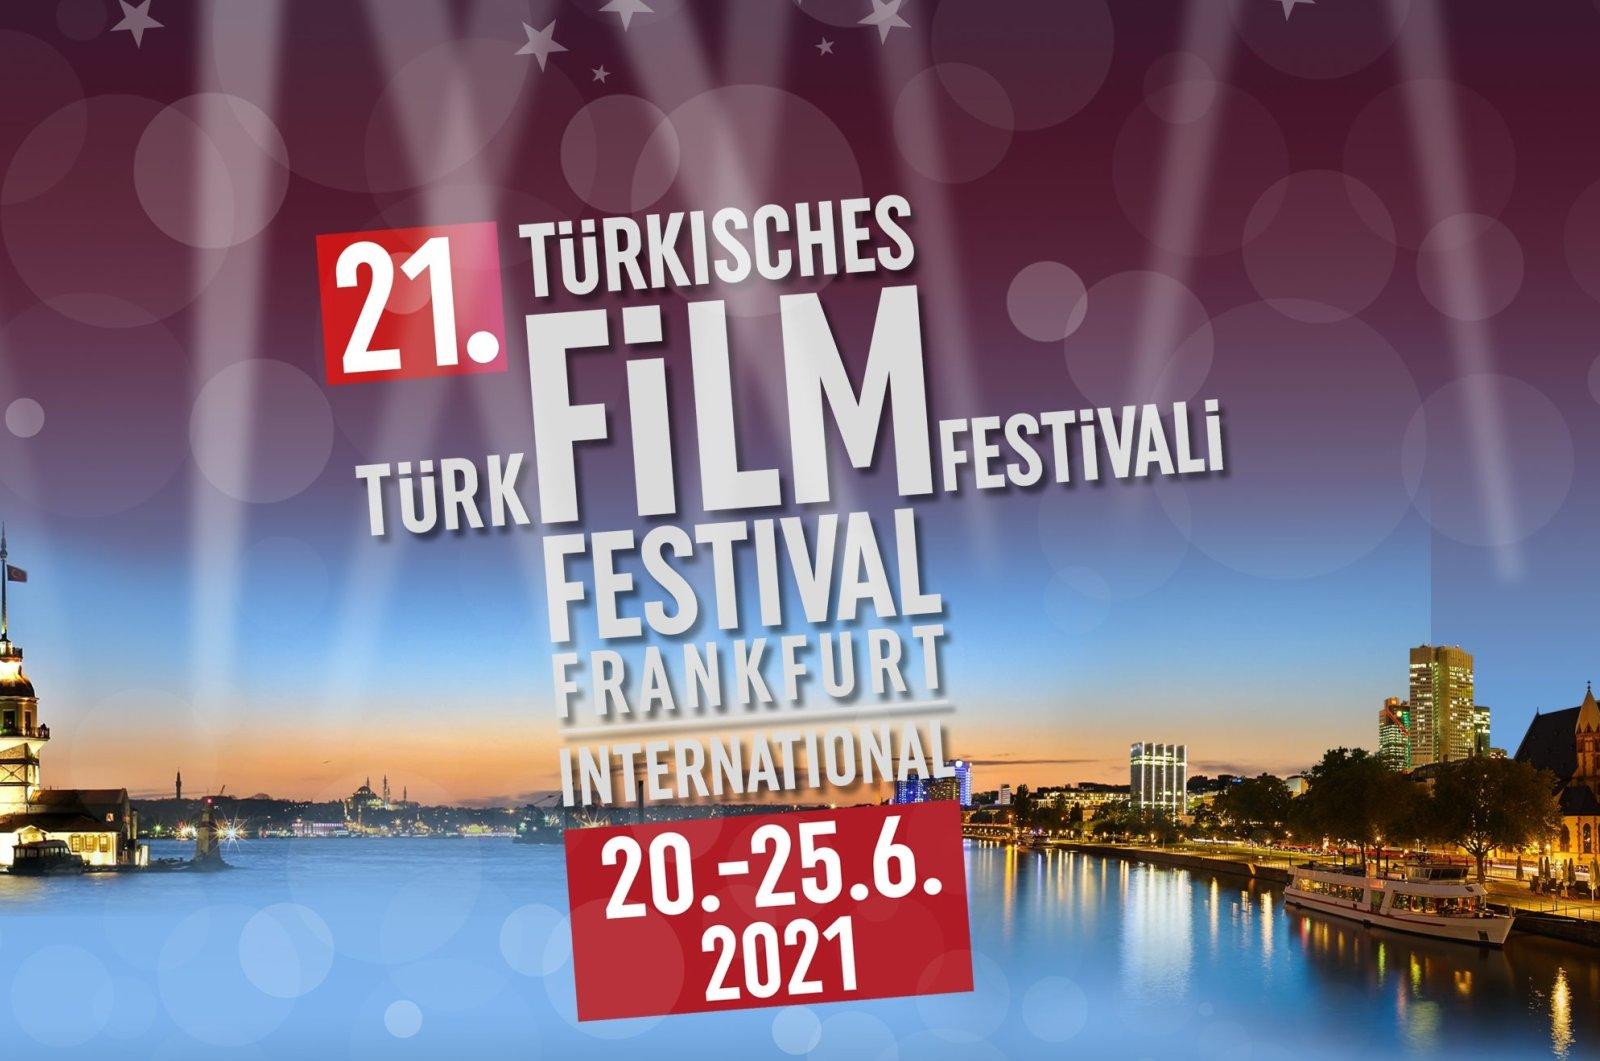 A poster of the 21st International Frankfurt Turkish Film Festival.